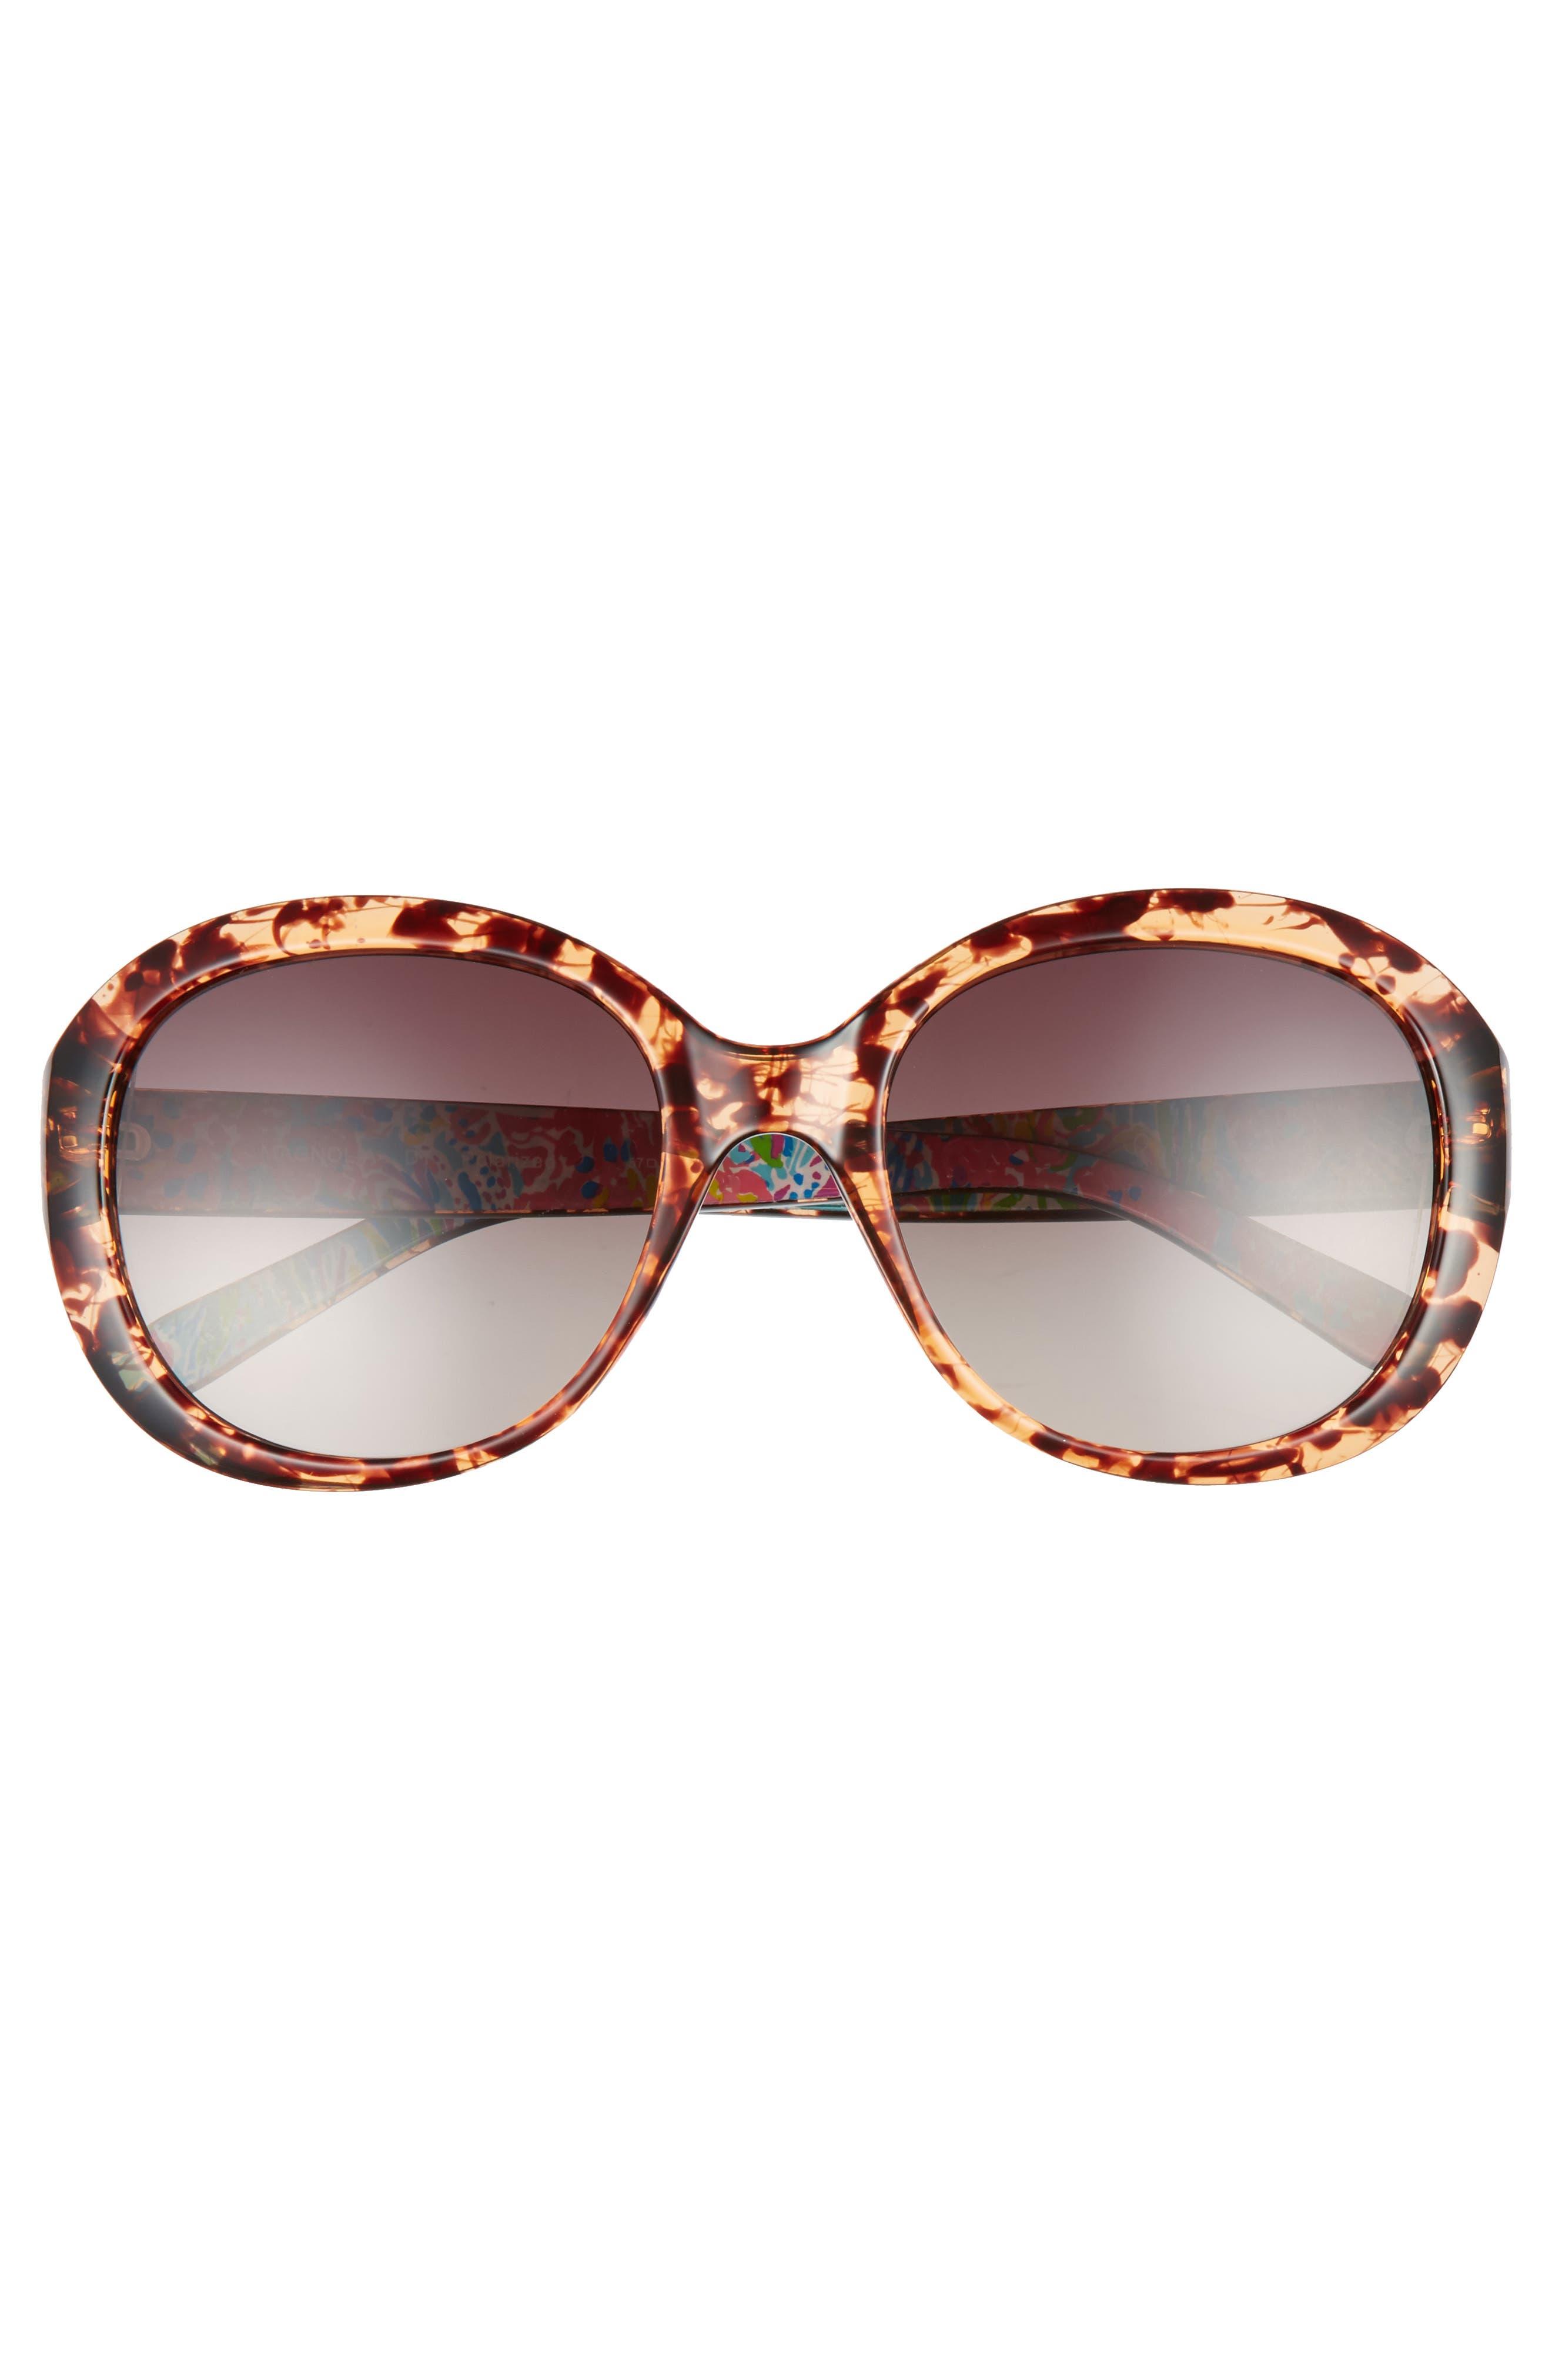 Magnolia 57mm Polarized Round Sunglasses,                             Alternate thumbnail 3, color,                             HAVANA